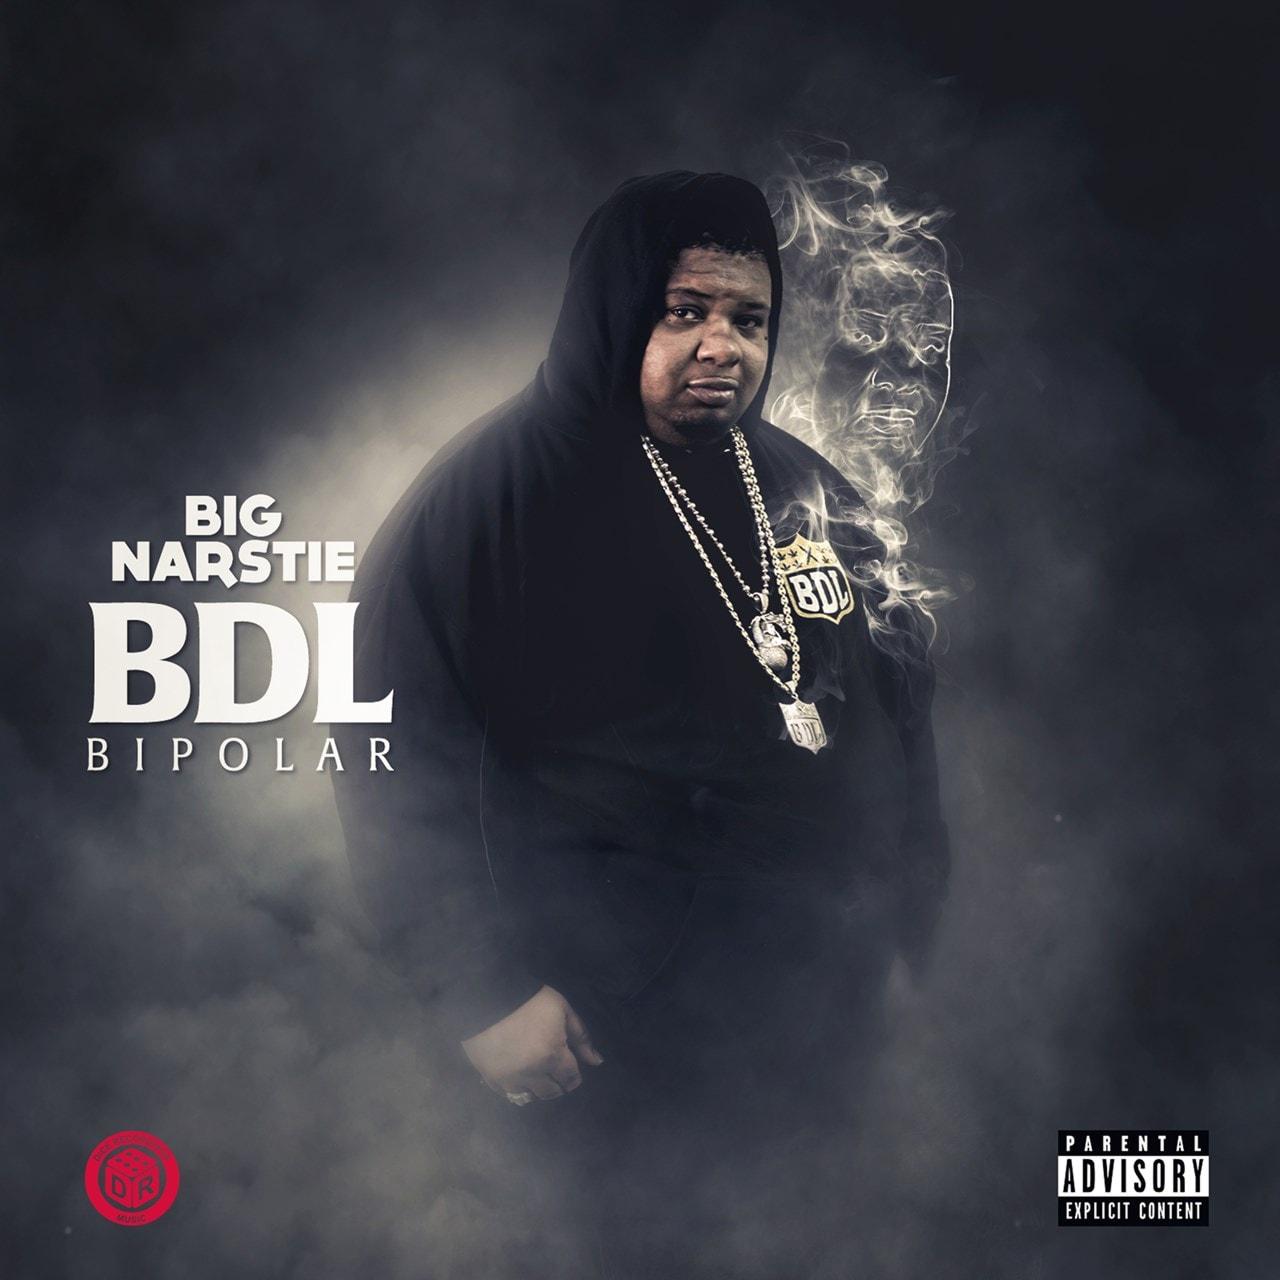 BDL Bipolar - 1